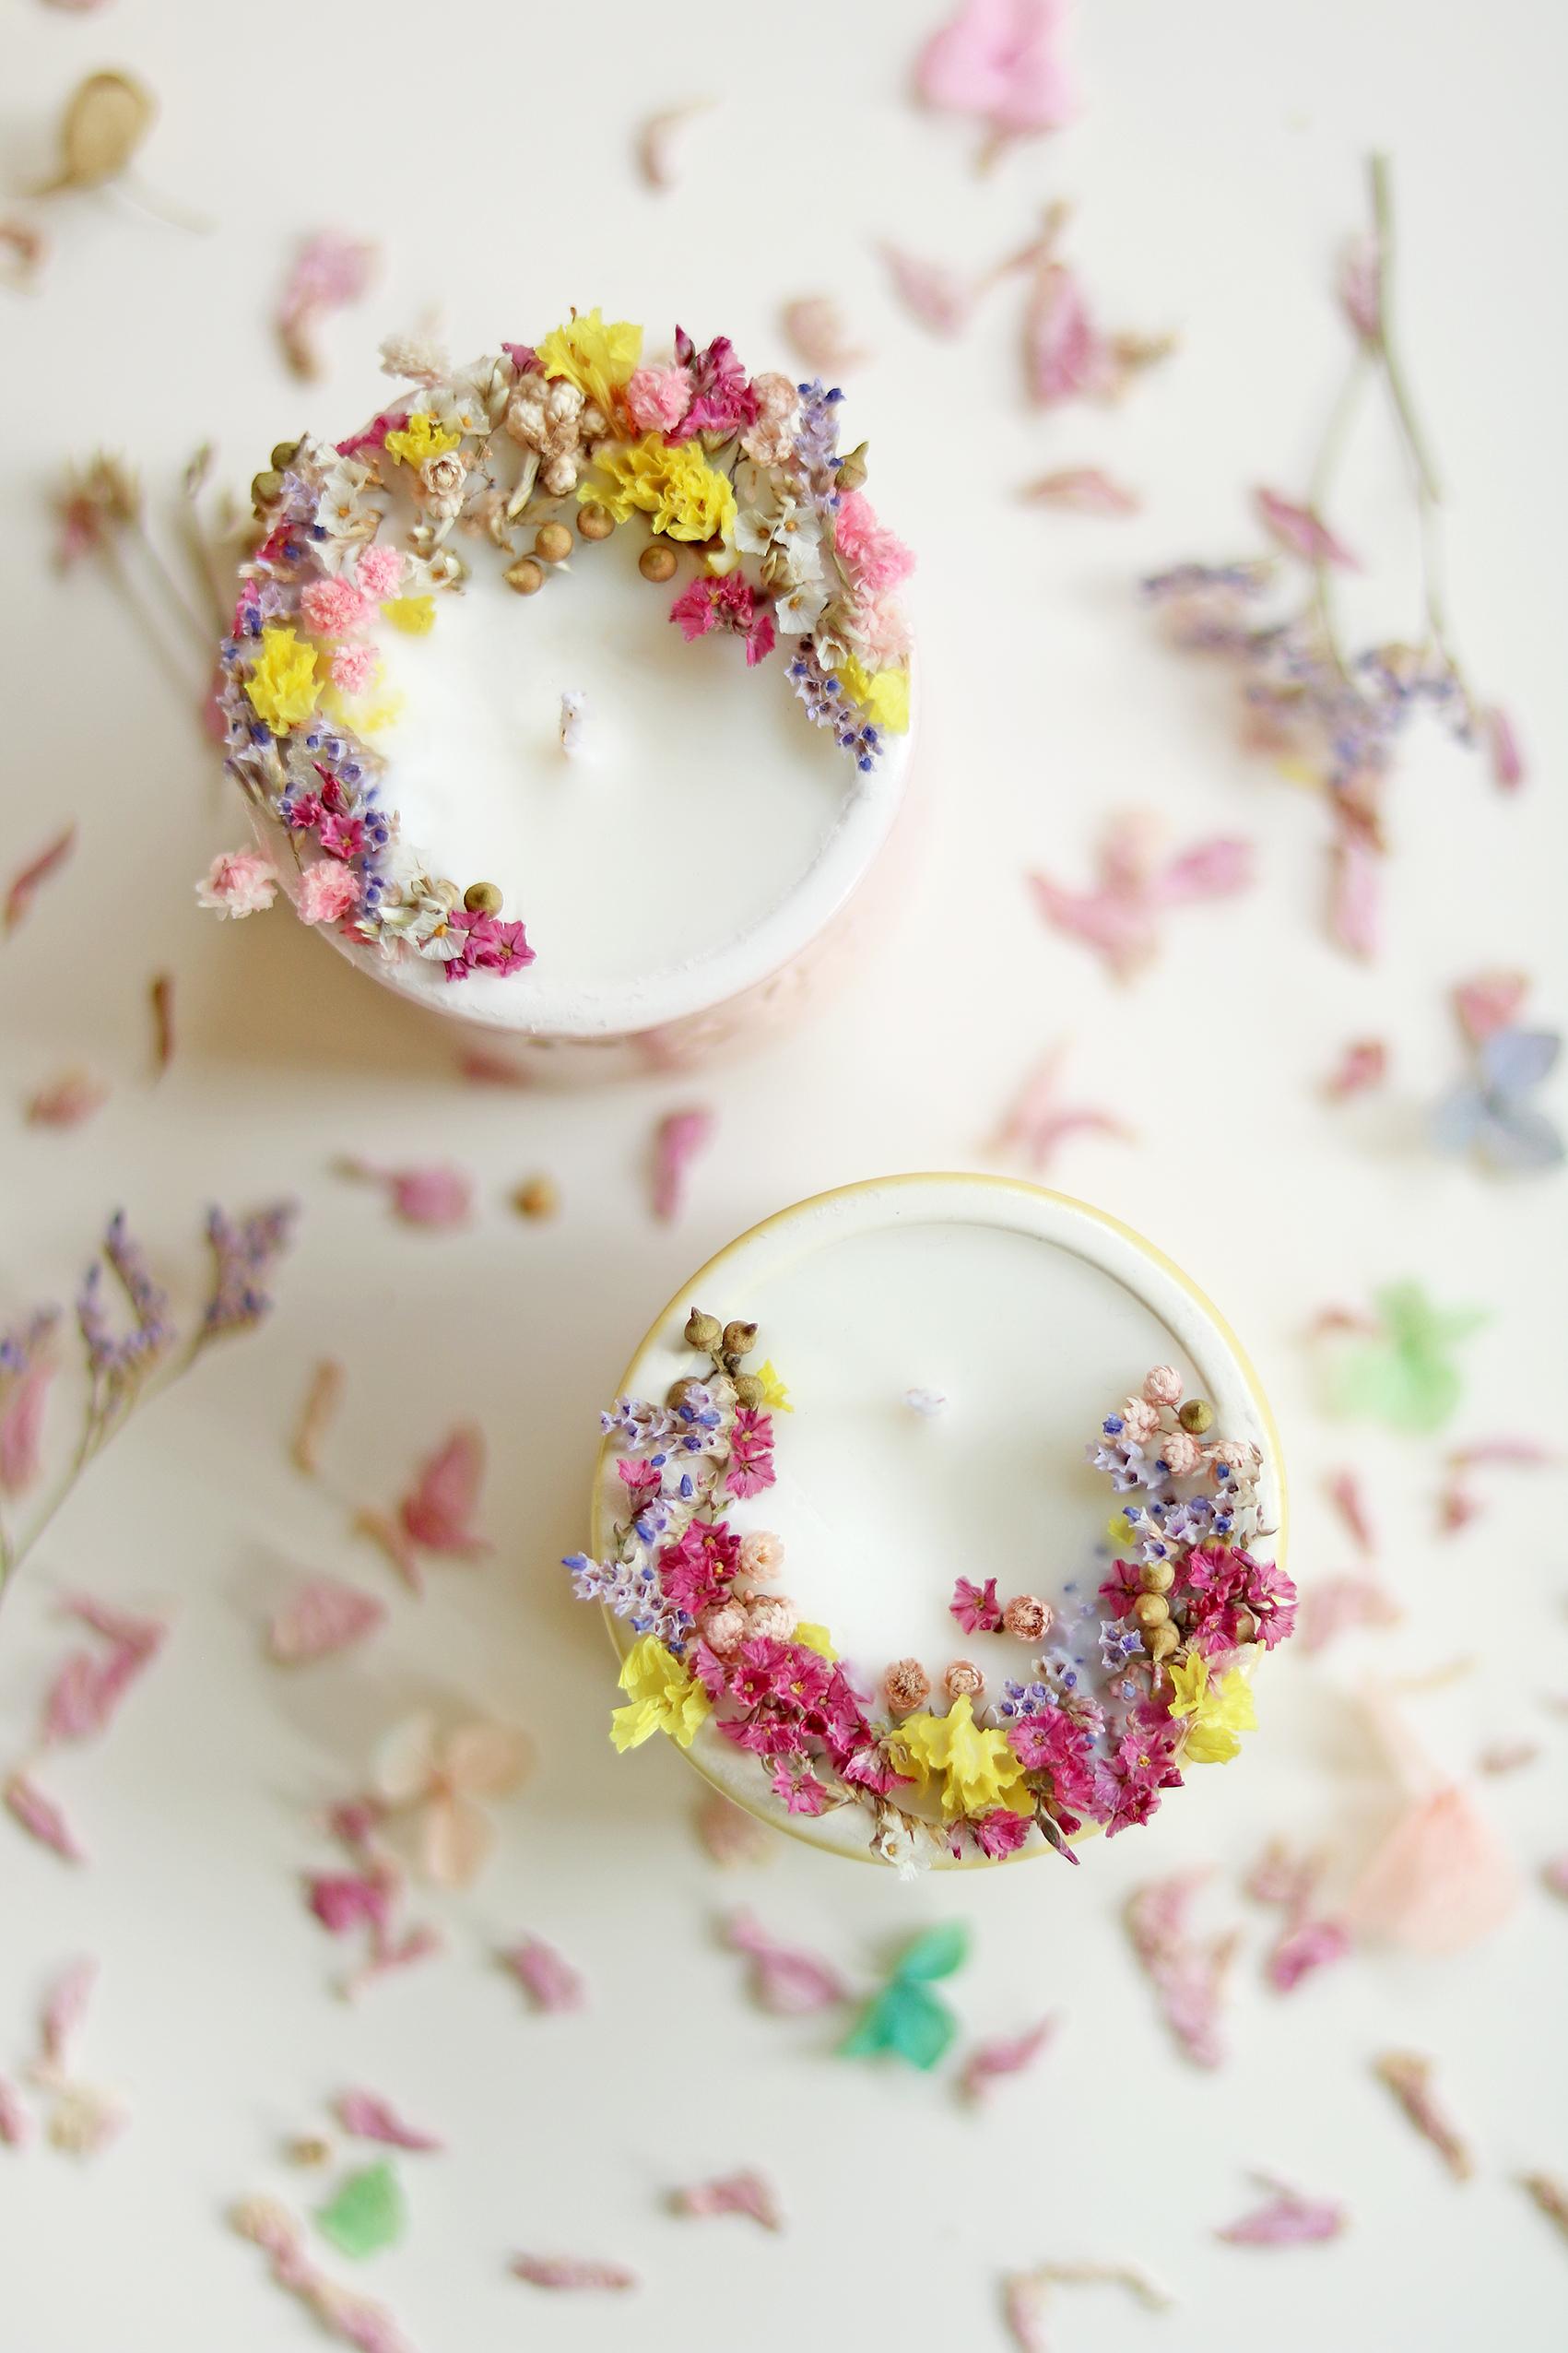 DIY-bougies-fleurs-sechees-la-fermiere